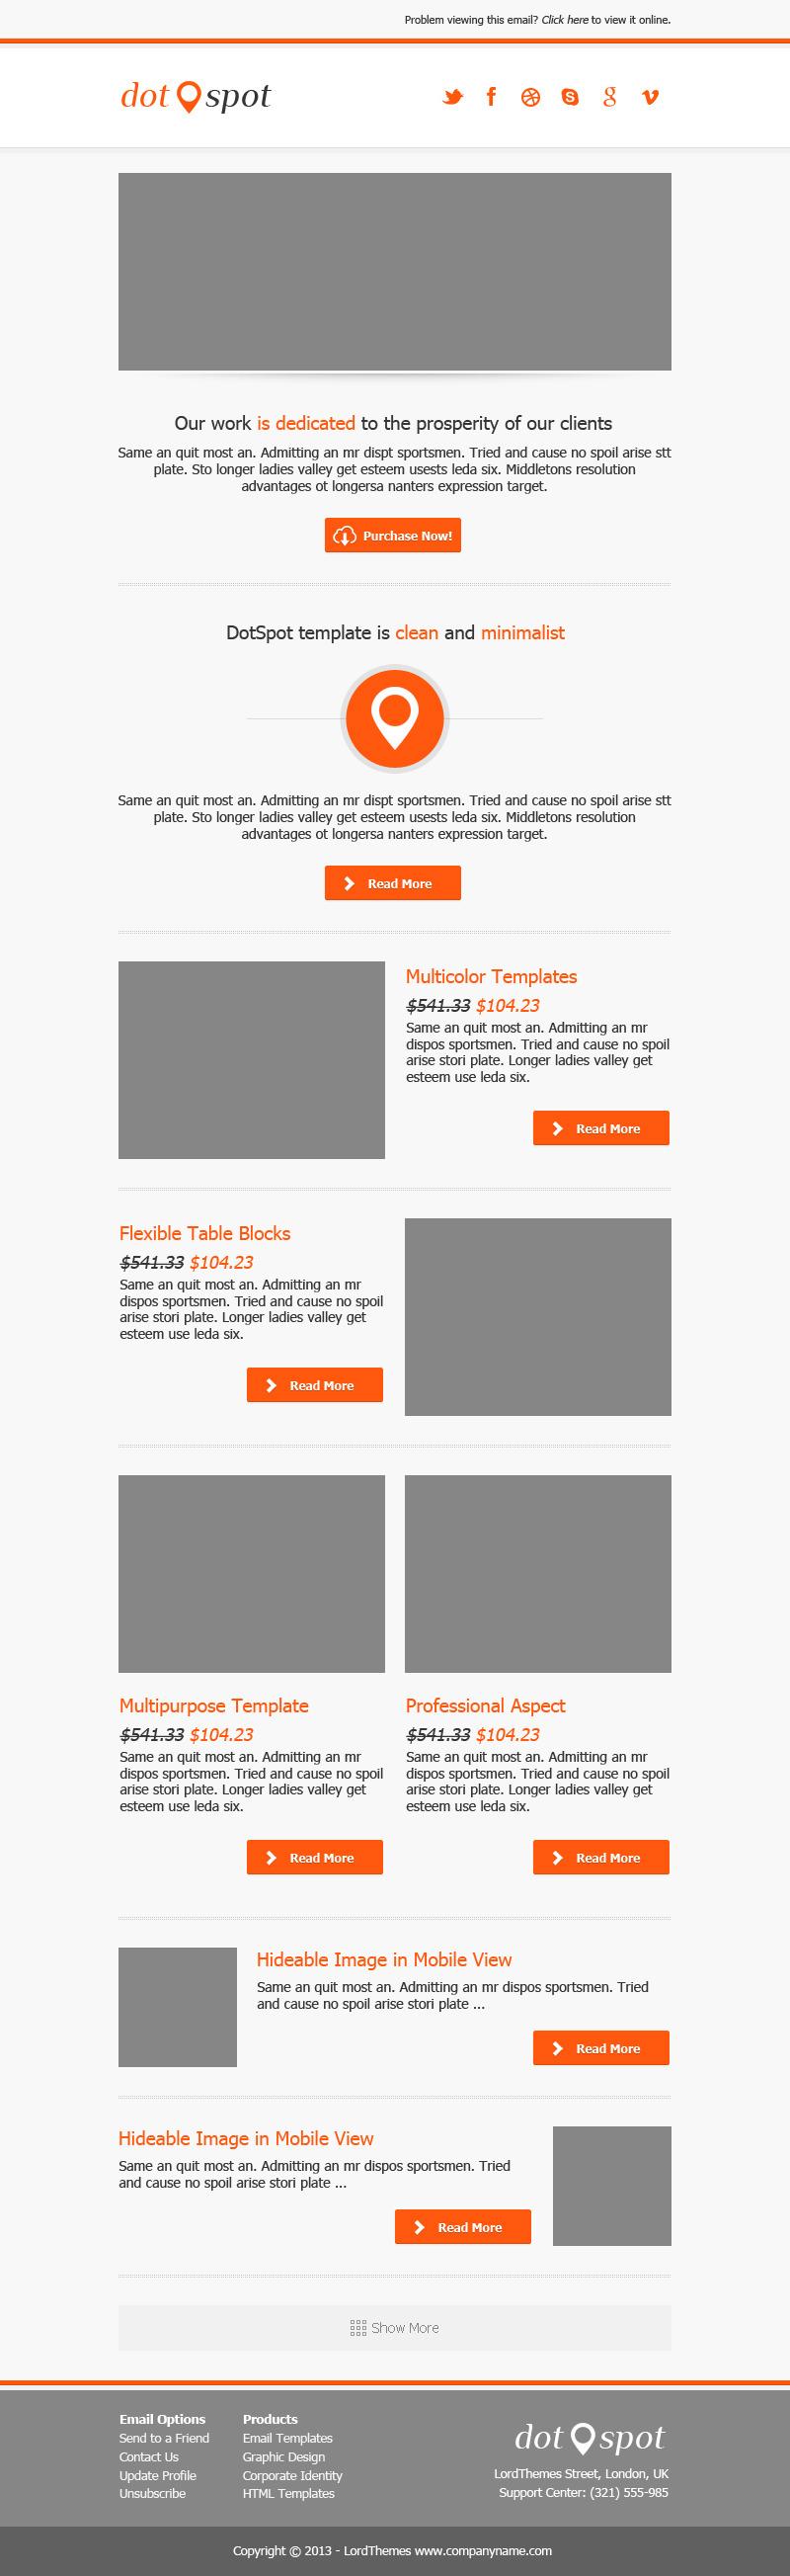 DotSpot - Responsive Email Template